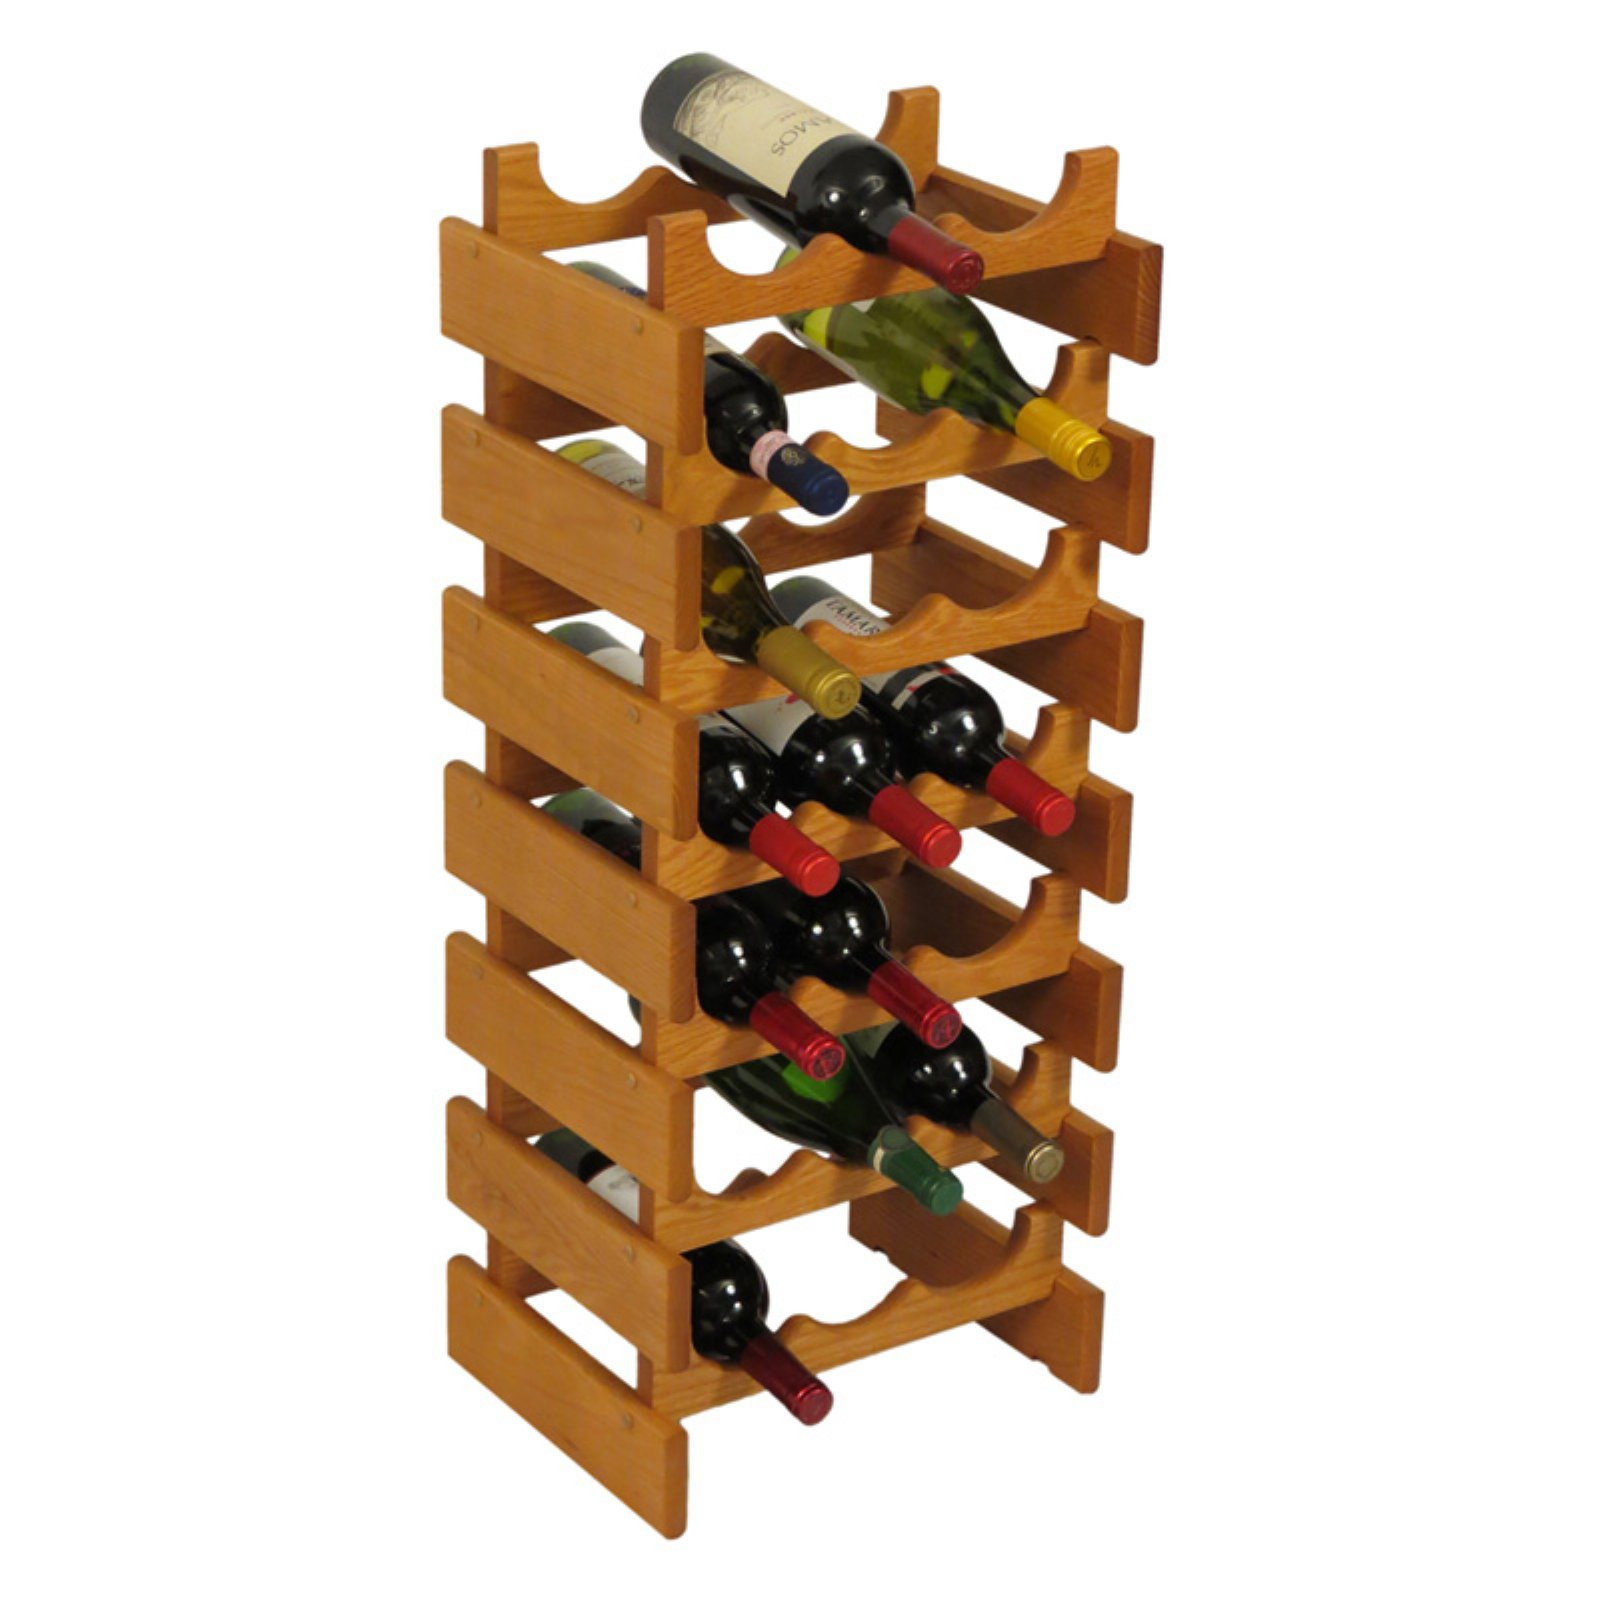 Wooden Mallet Dakota 21 Bottle Floor Wine Rack by Wooden Mallet